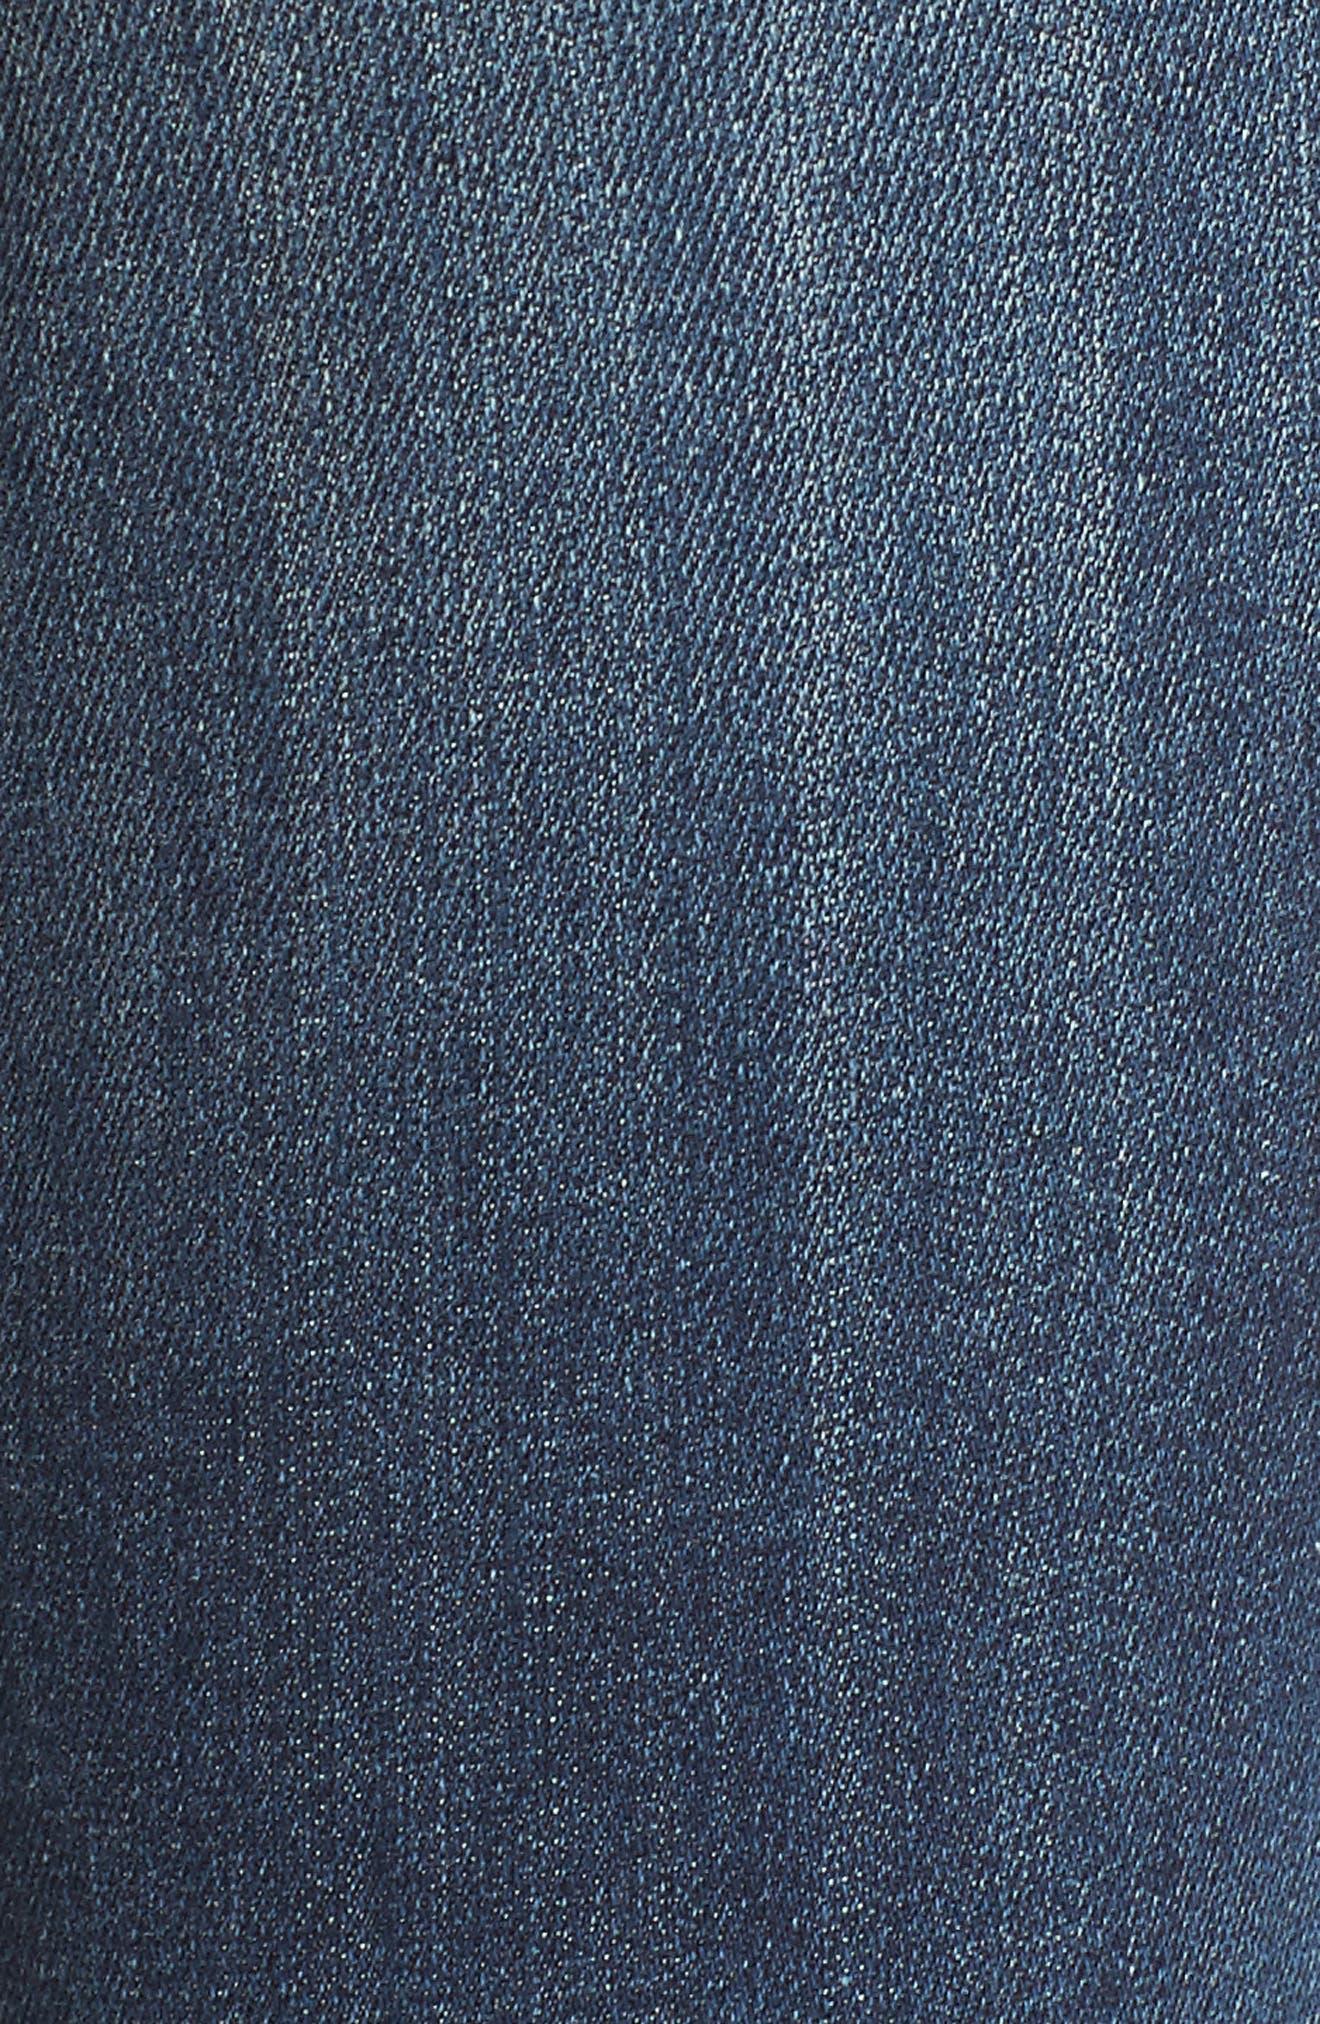 Jagger Skinny Jeans,                             Alternate thumbnail 6, color,                             Medium Wash